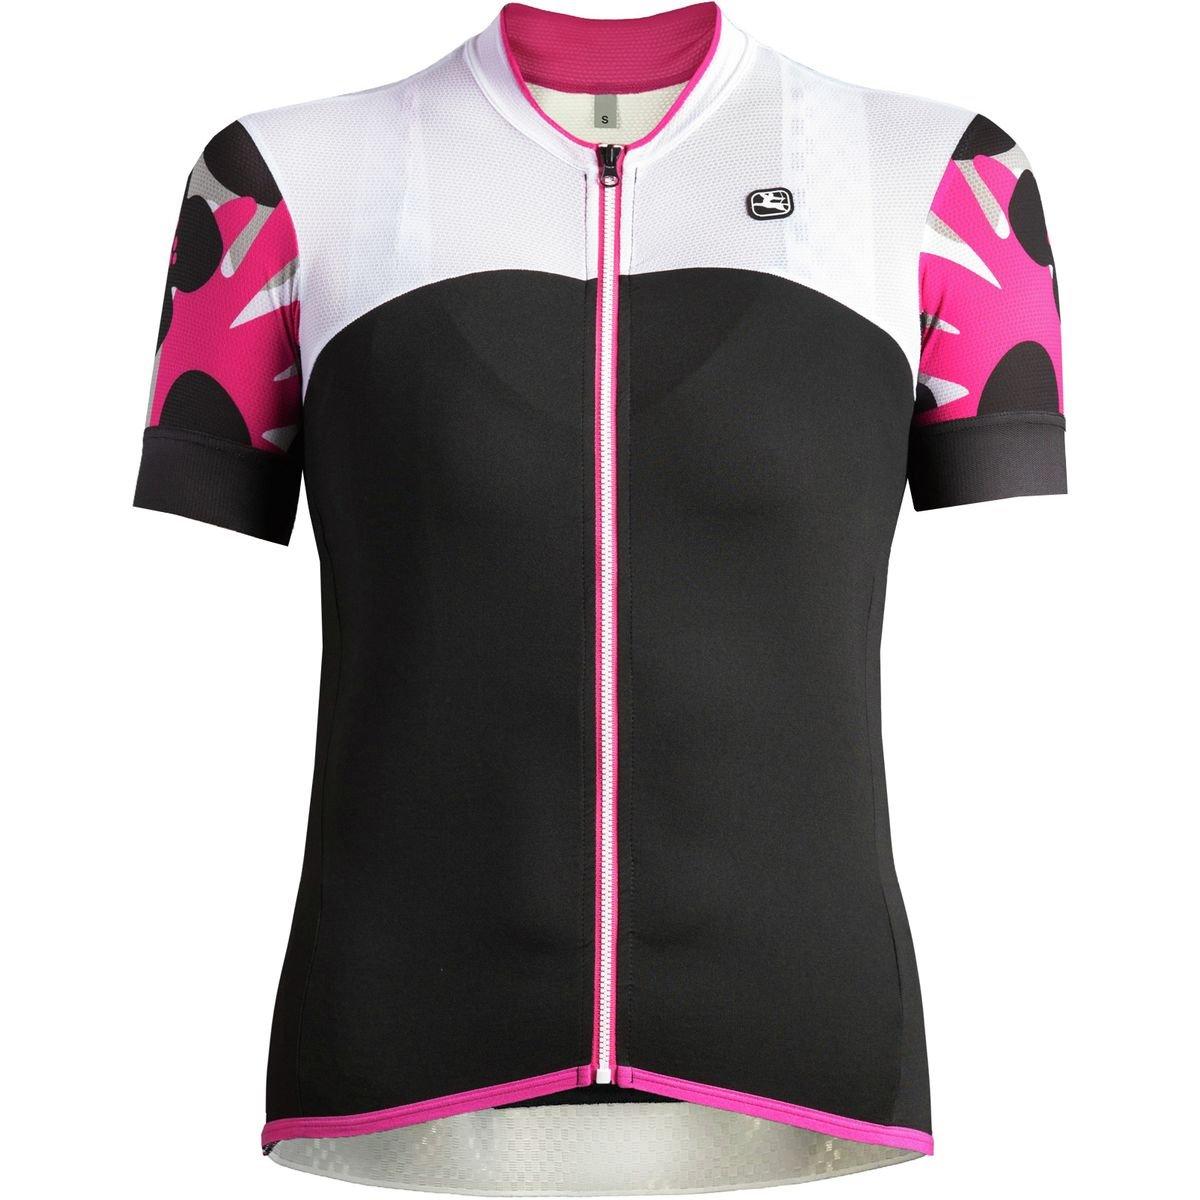 Giordana Lungo Short-Sleeve Jersey - Women's Black/White/Fuchsia, XS